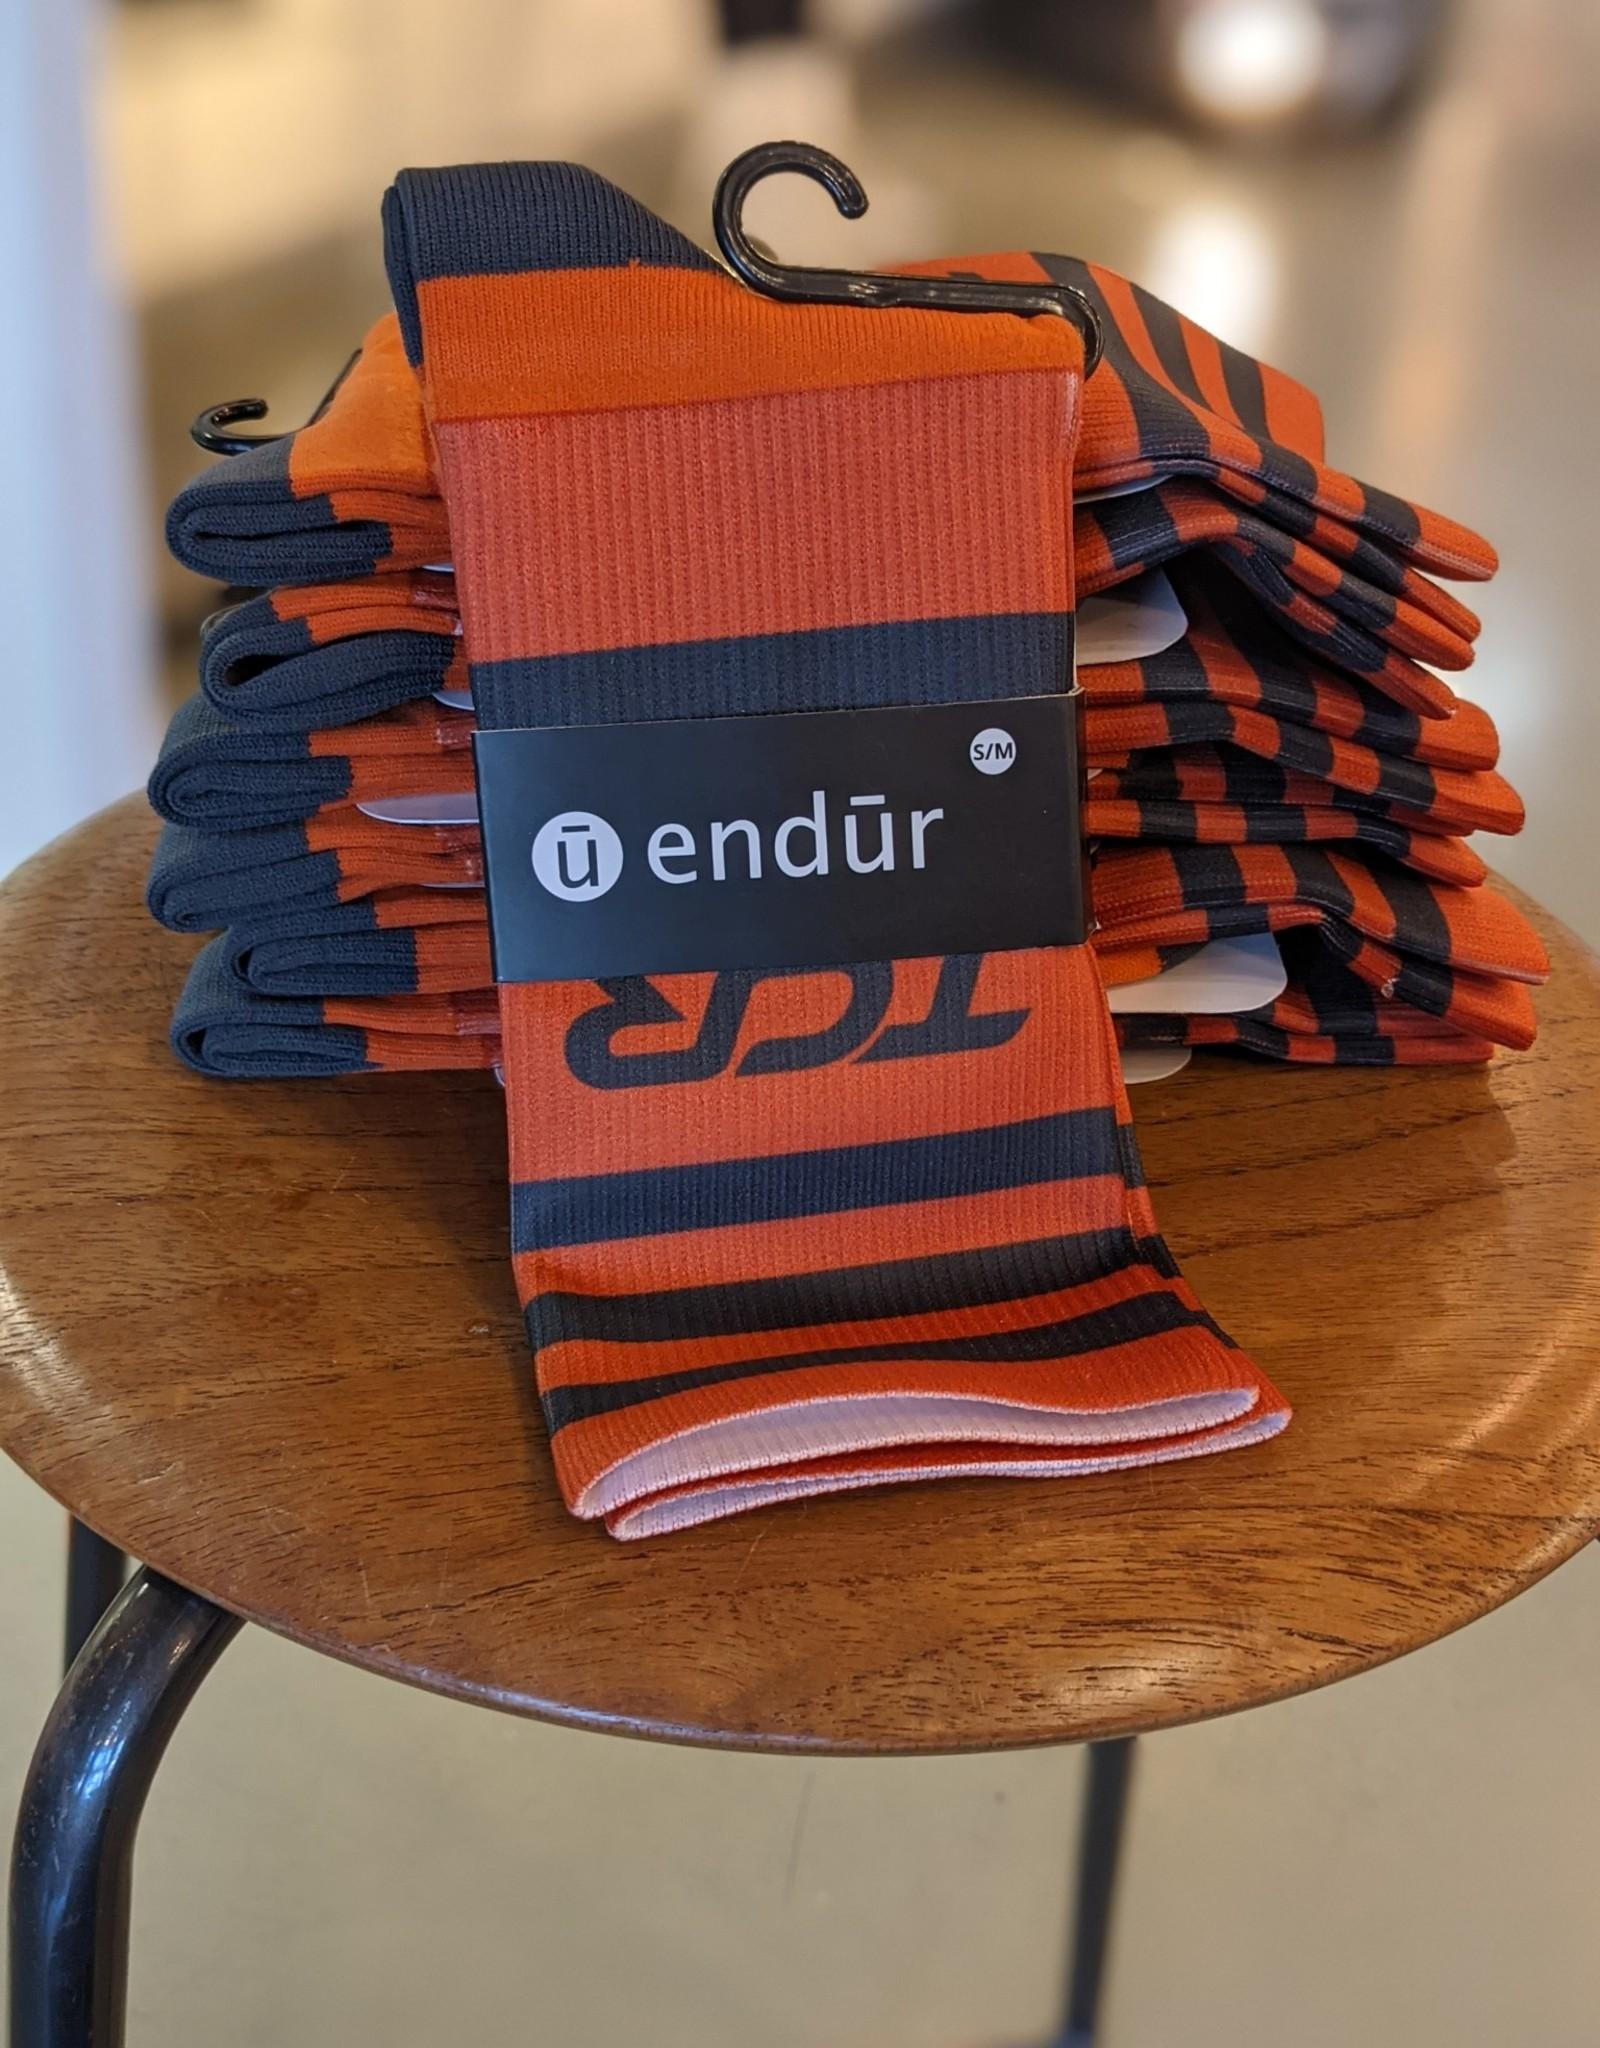 TCR Endur Knit Sock- Orange/Grey- S/M